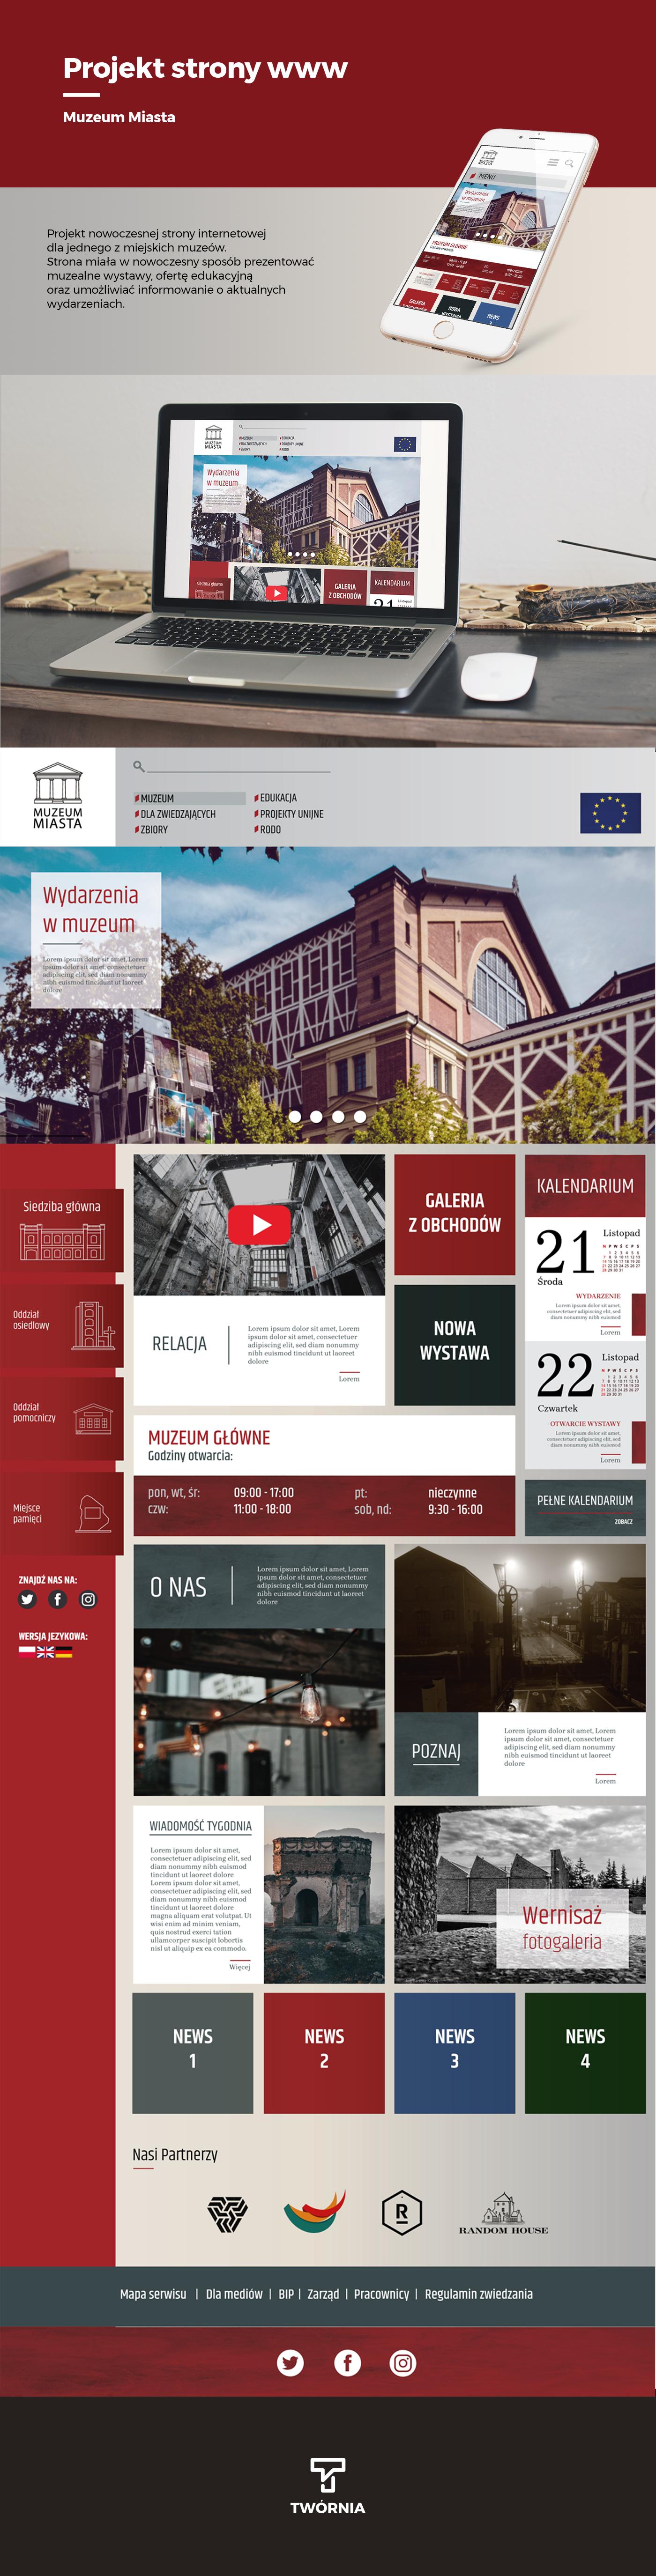 Webdesign Website www museum web project website project site